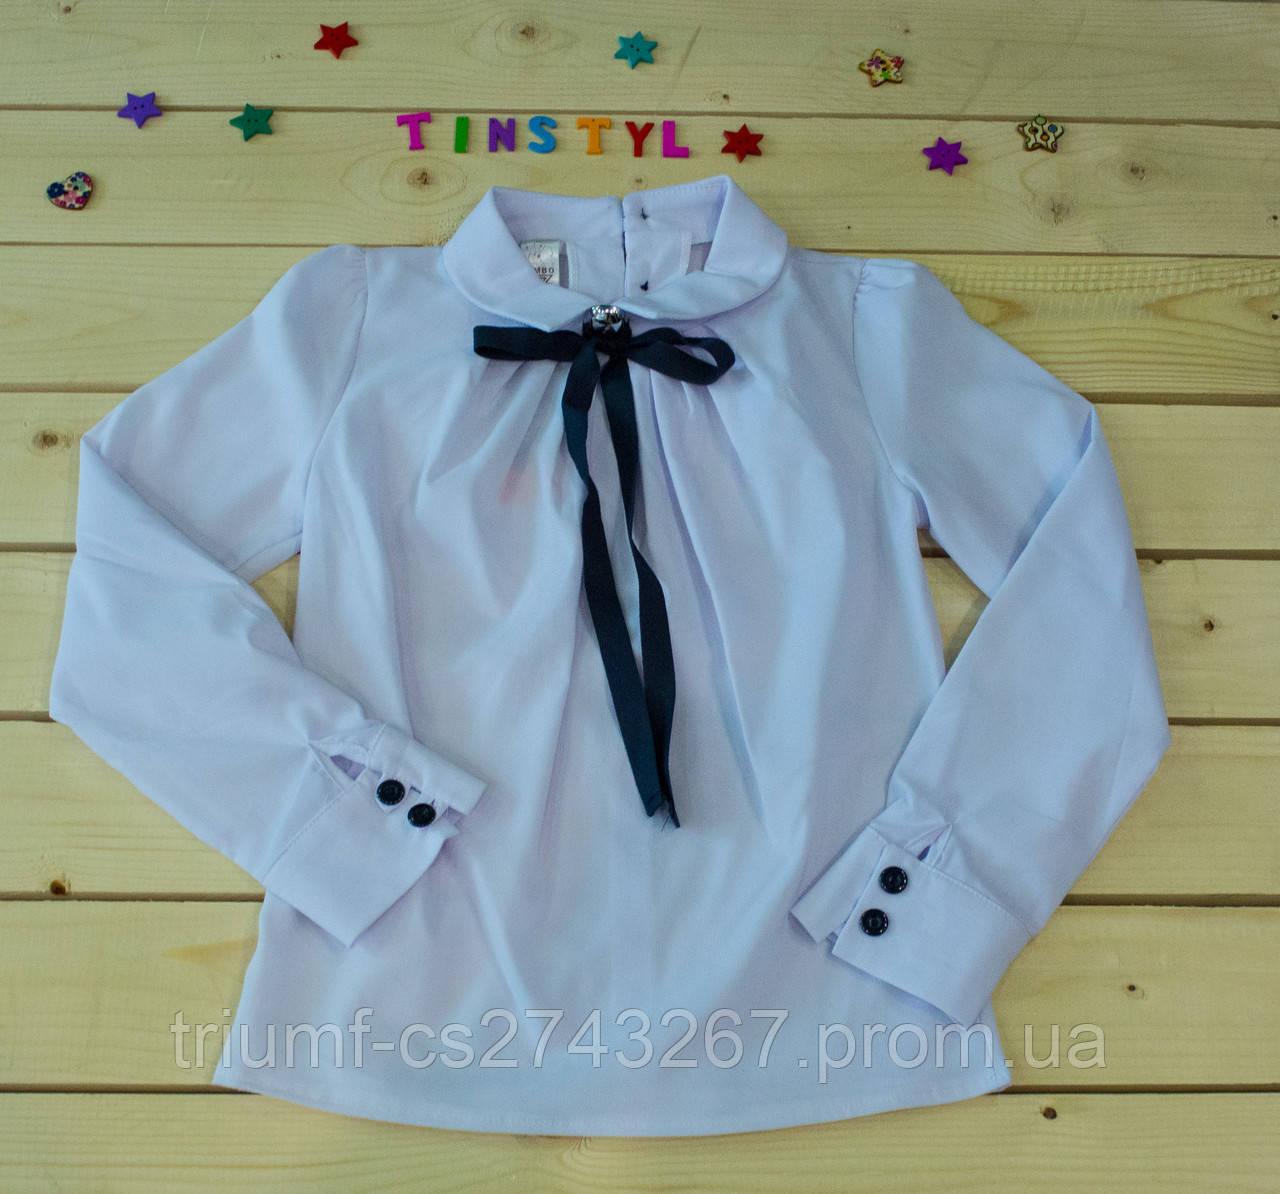 6179ede80b0 Нарядная блузка для девочки на рост 134-146 см   продажа